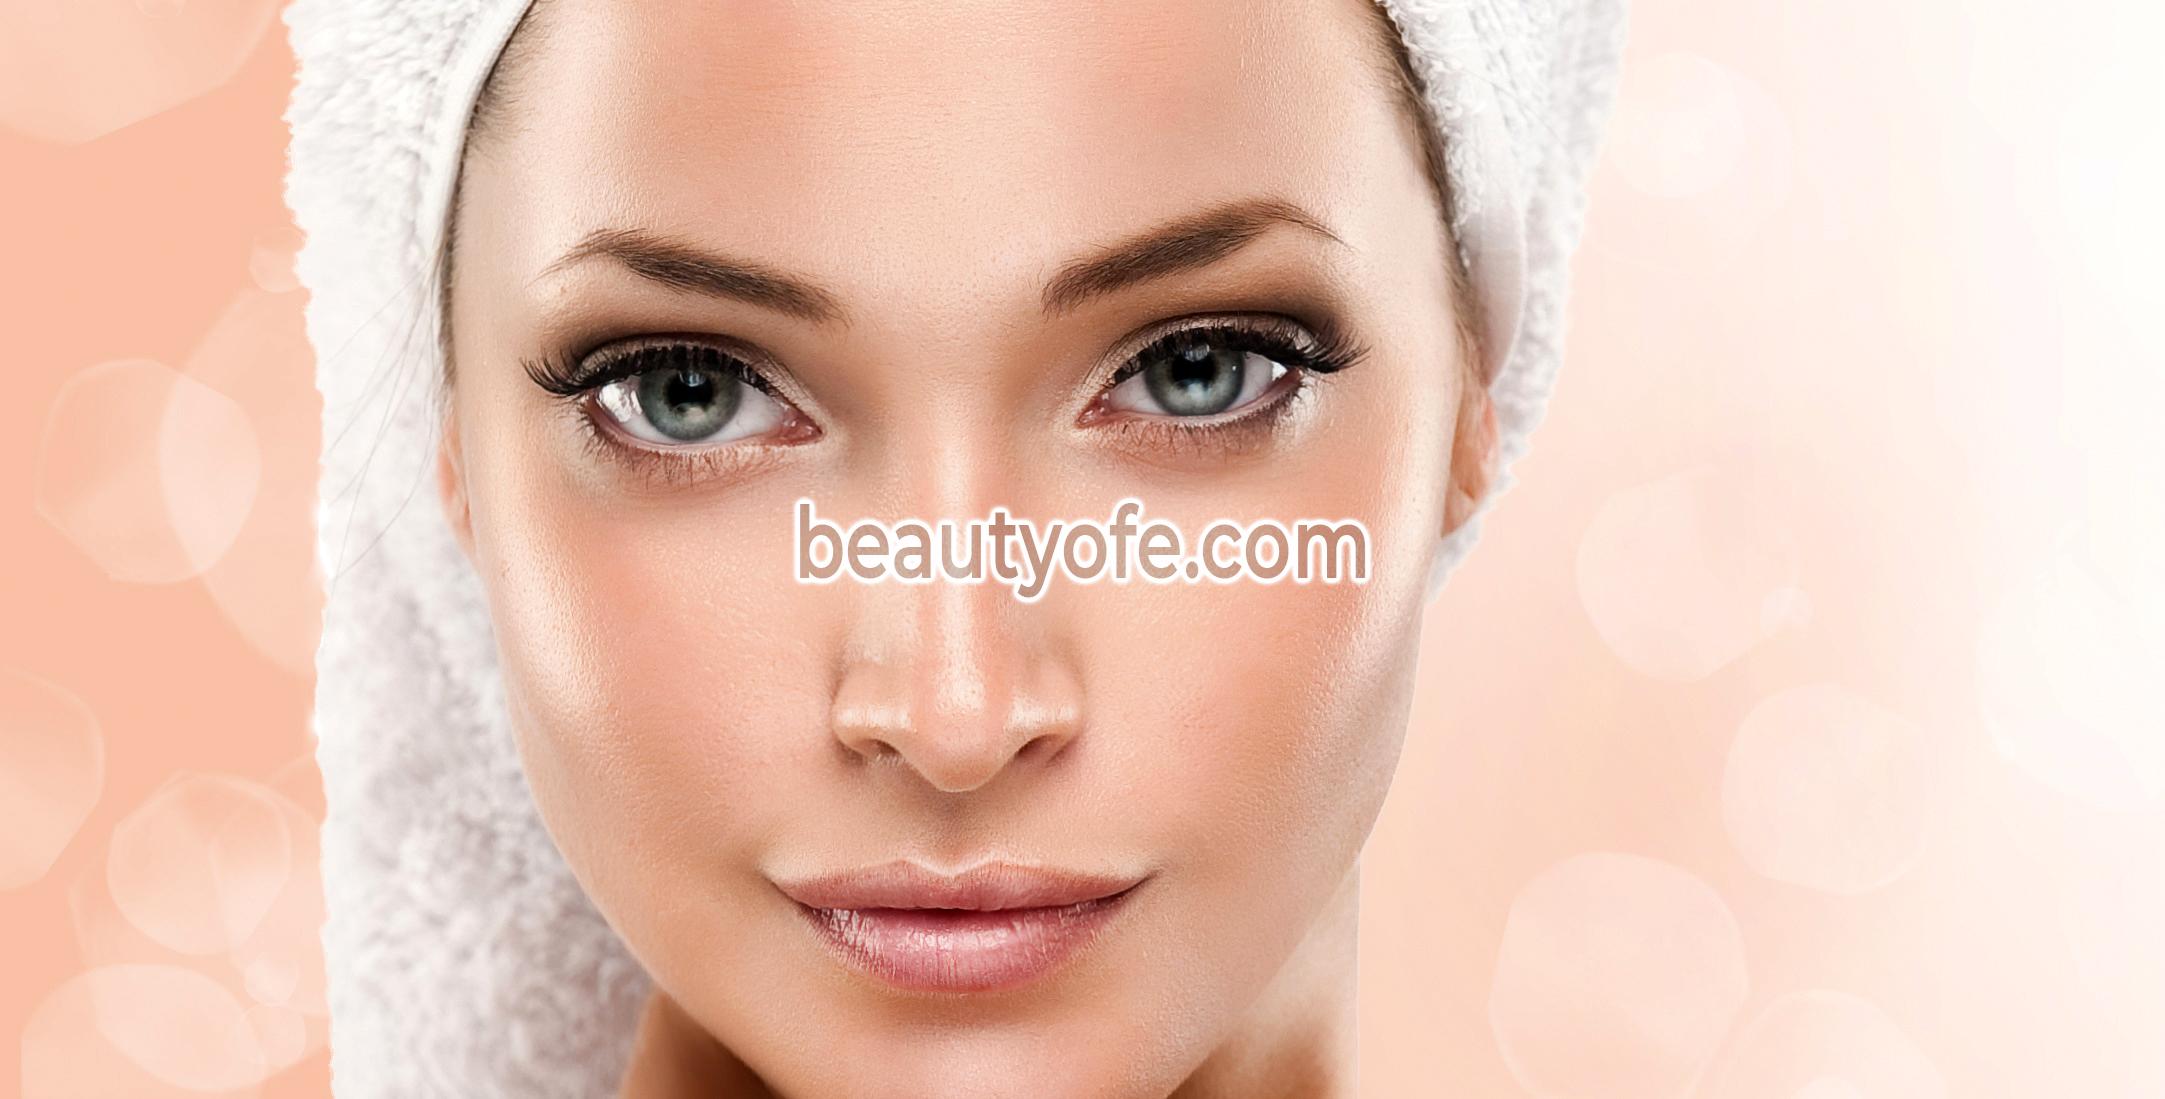 Vitamin E Oil Benefits Hair Skin Face Eyes Lips And Nails